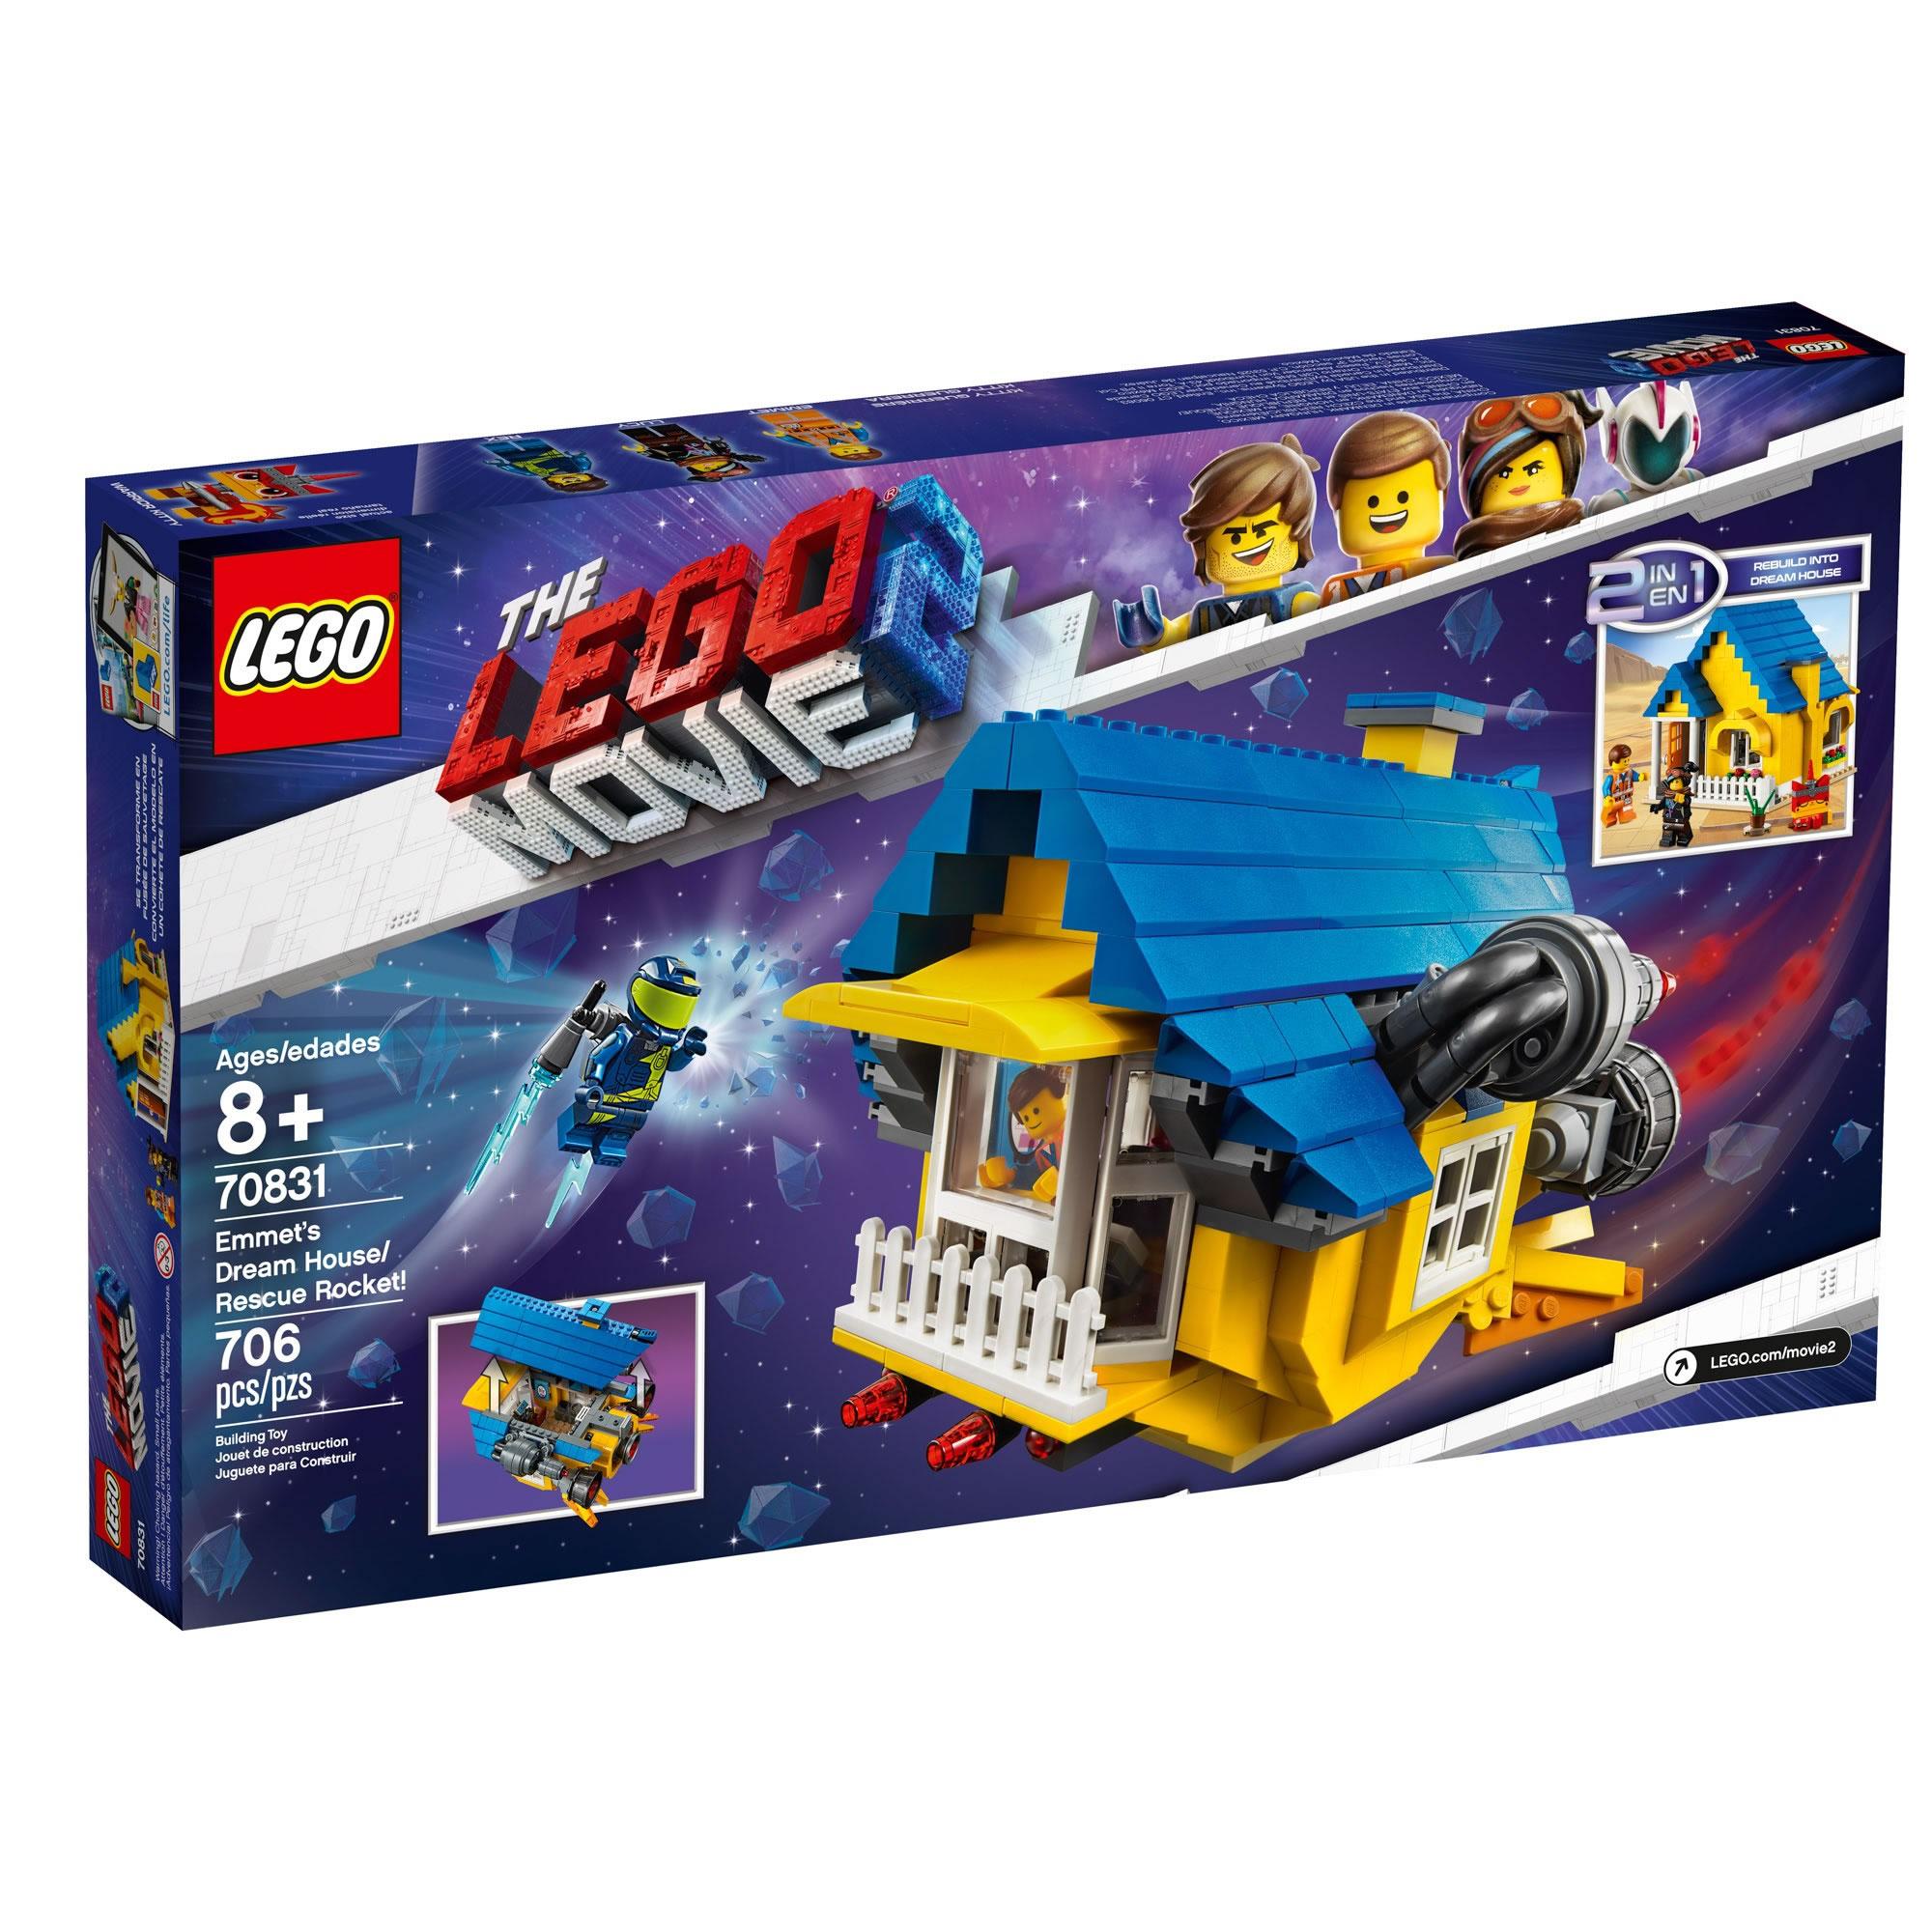 the-lego-movie-2-emmets-dream-house-and-rescue-rocket-70831-box-2-1-2019 zusammengebaut.com